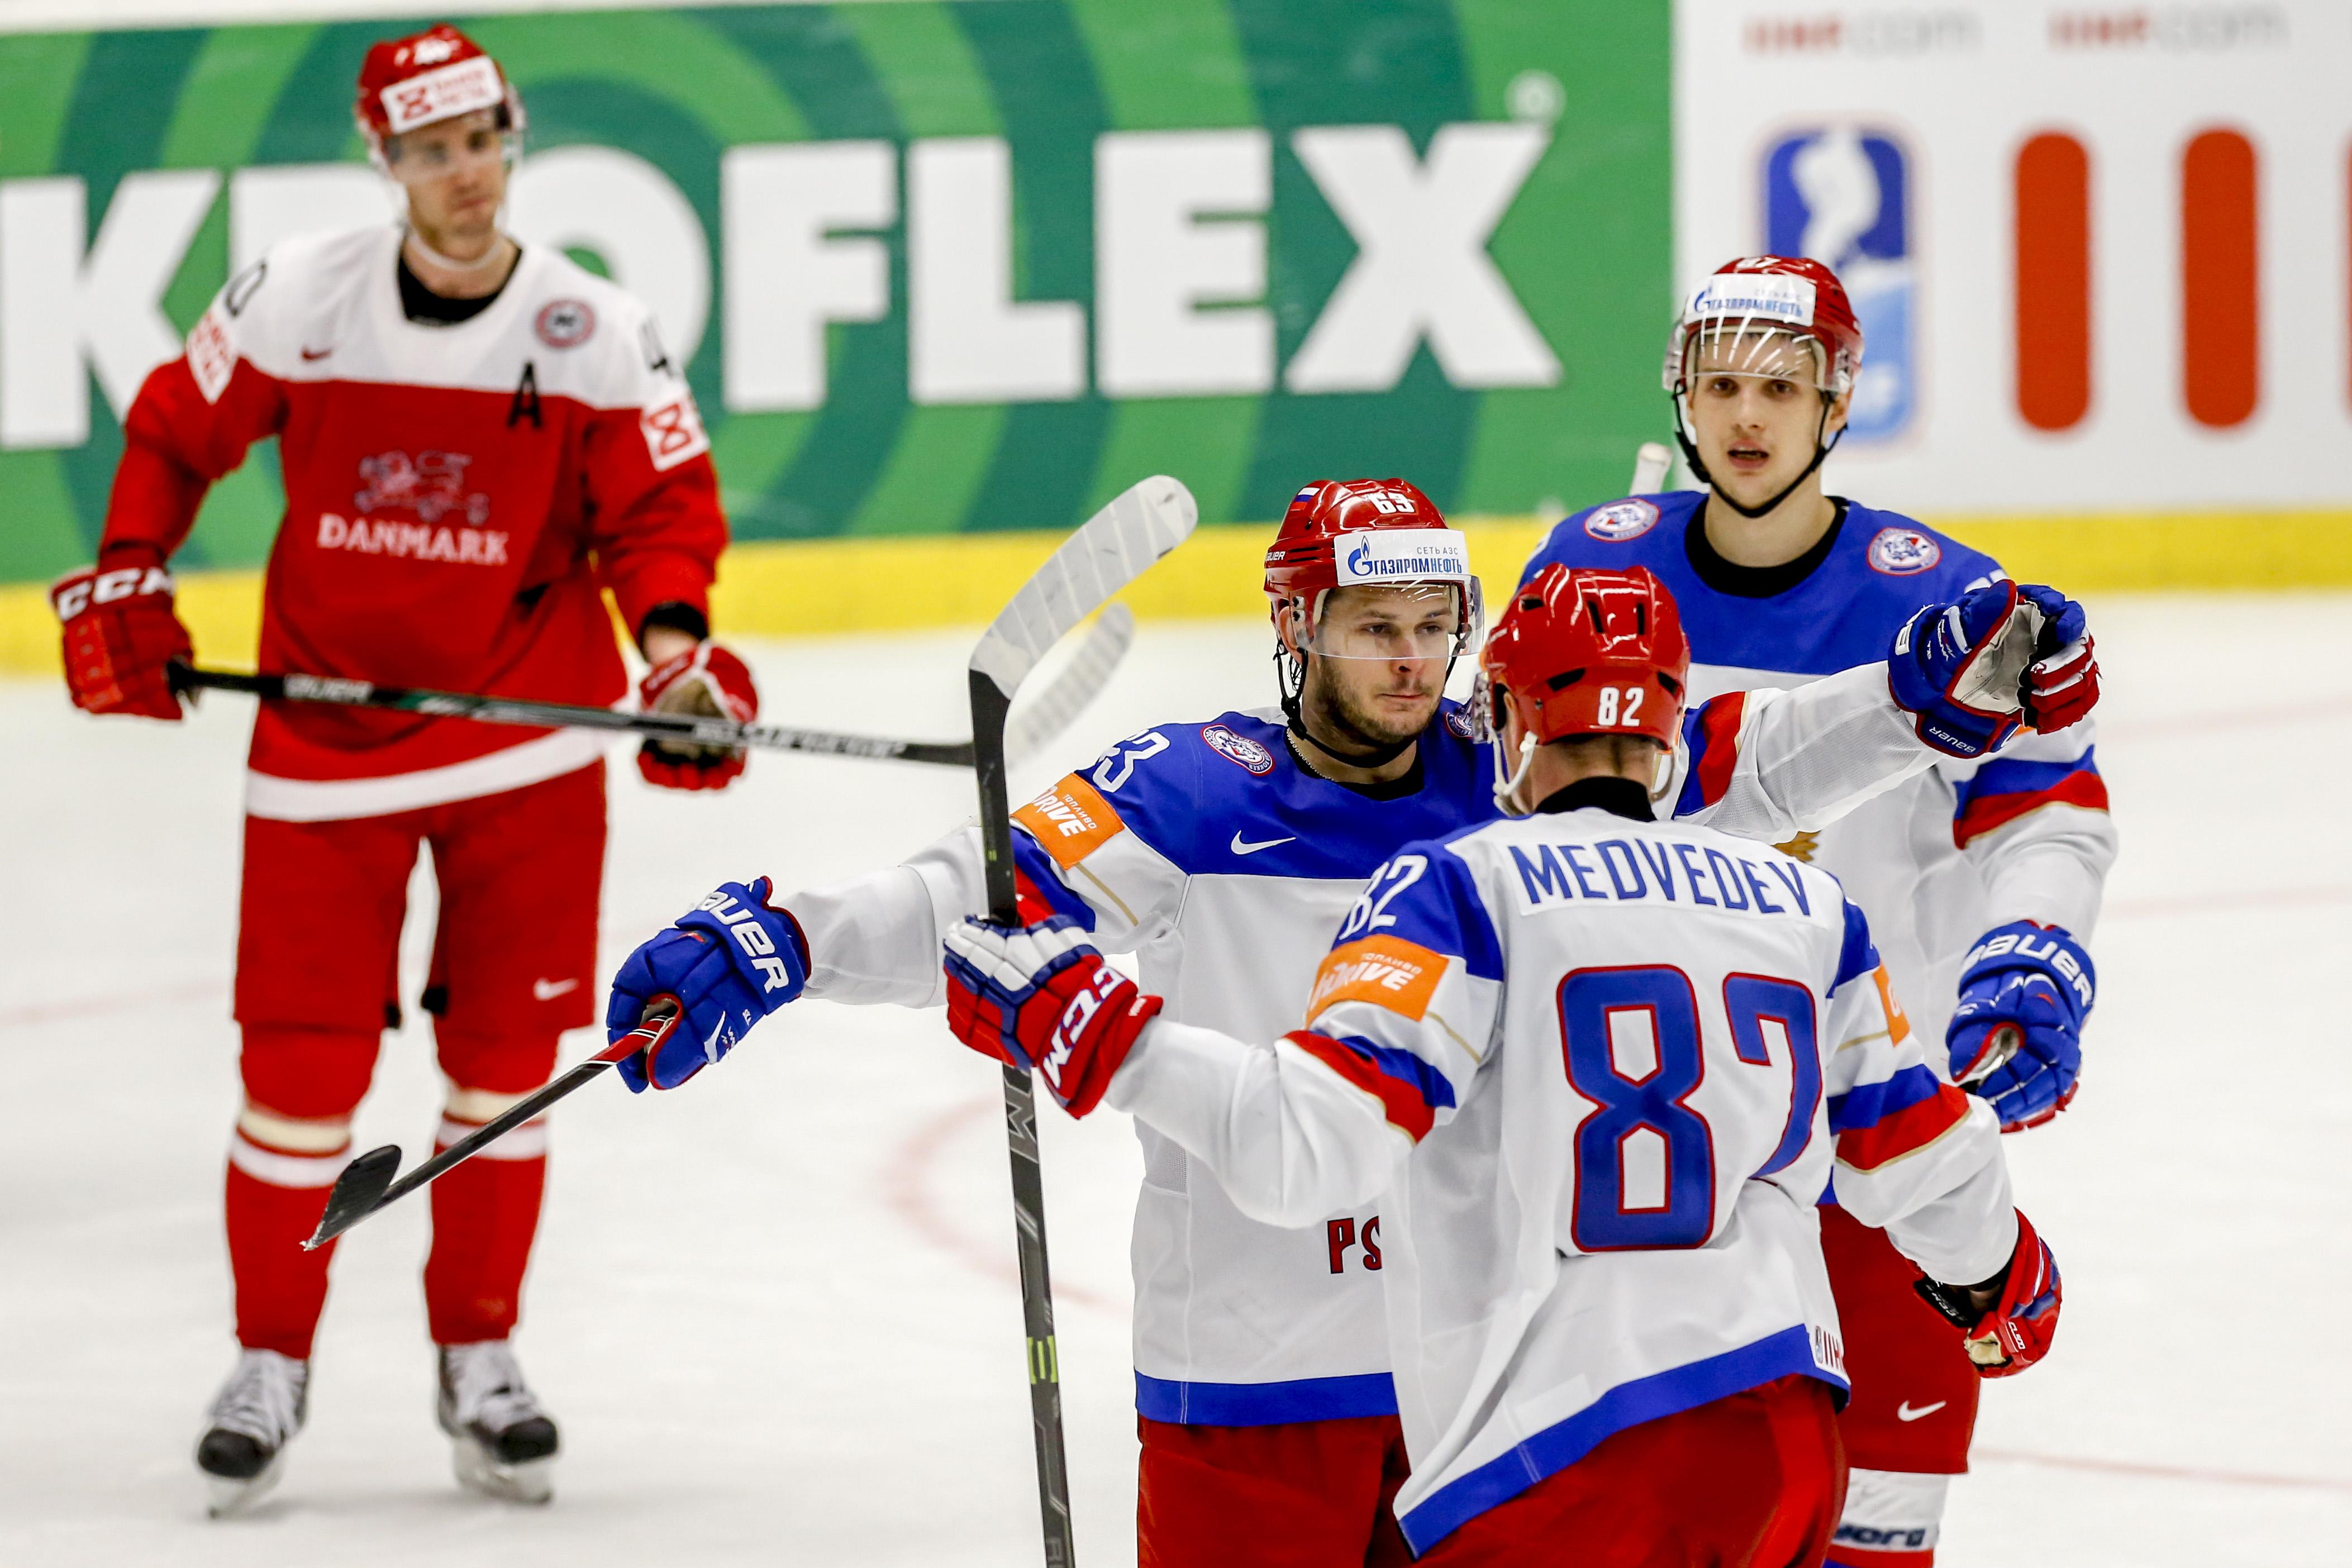 Прогноз на хоккей россия дания